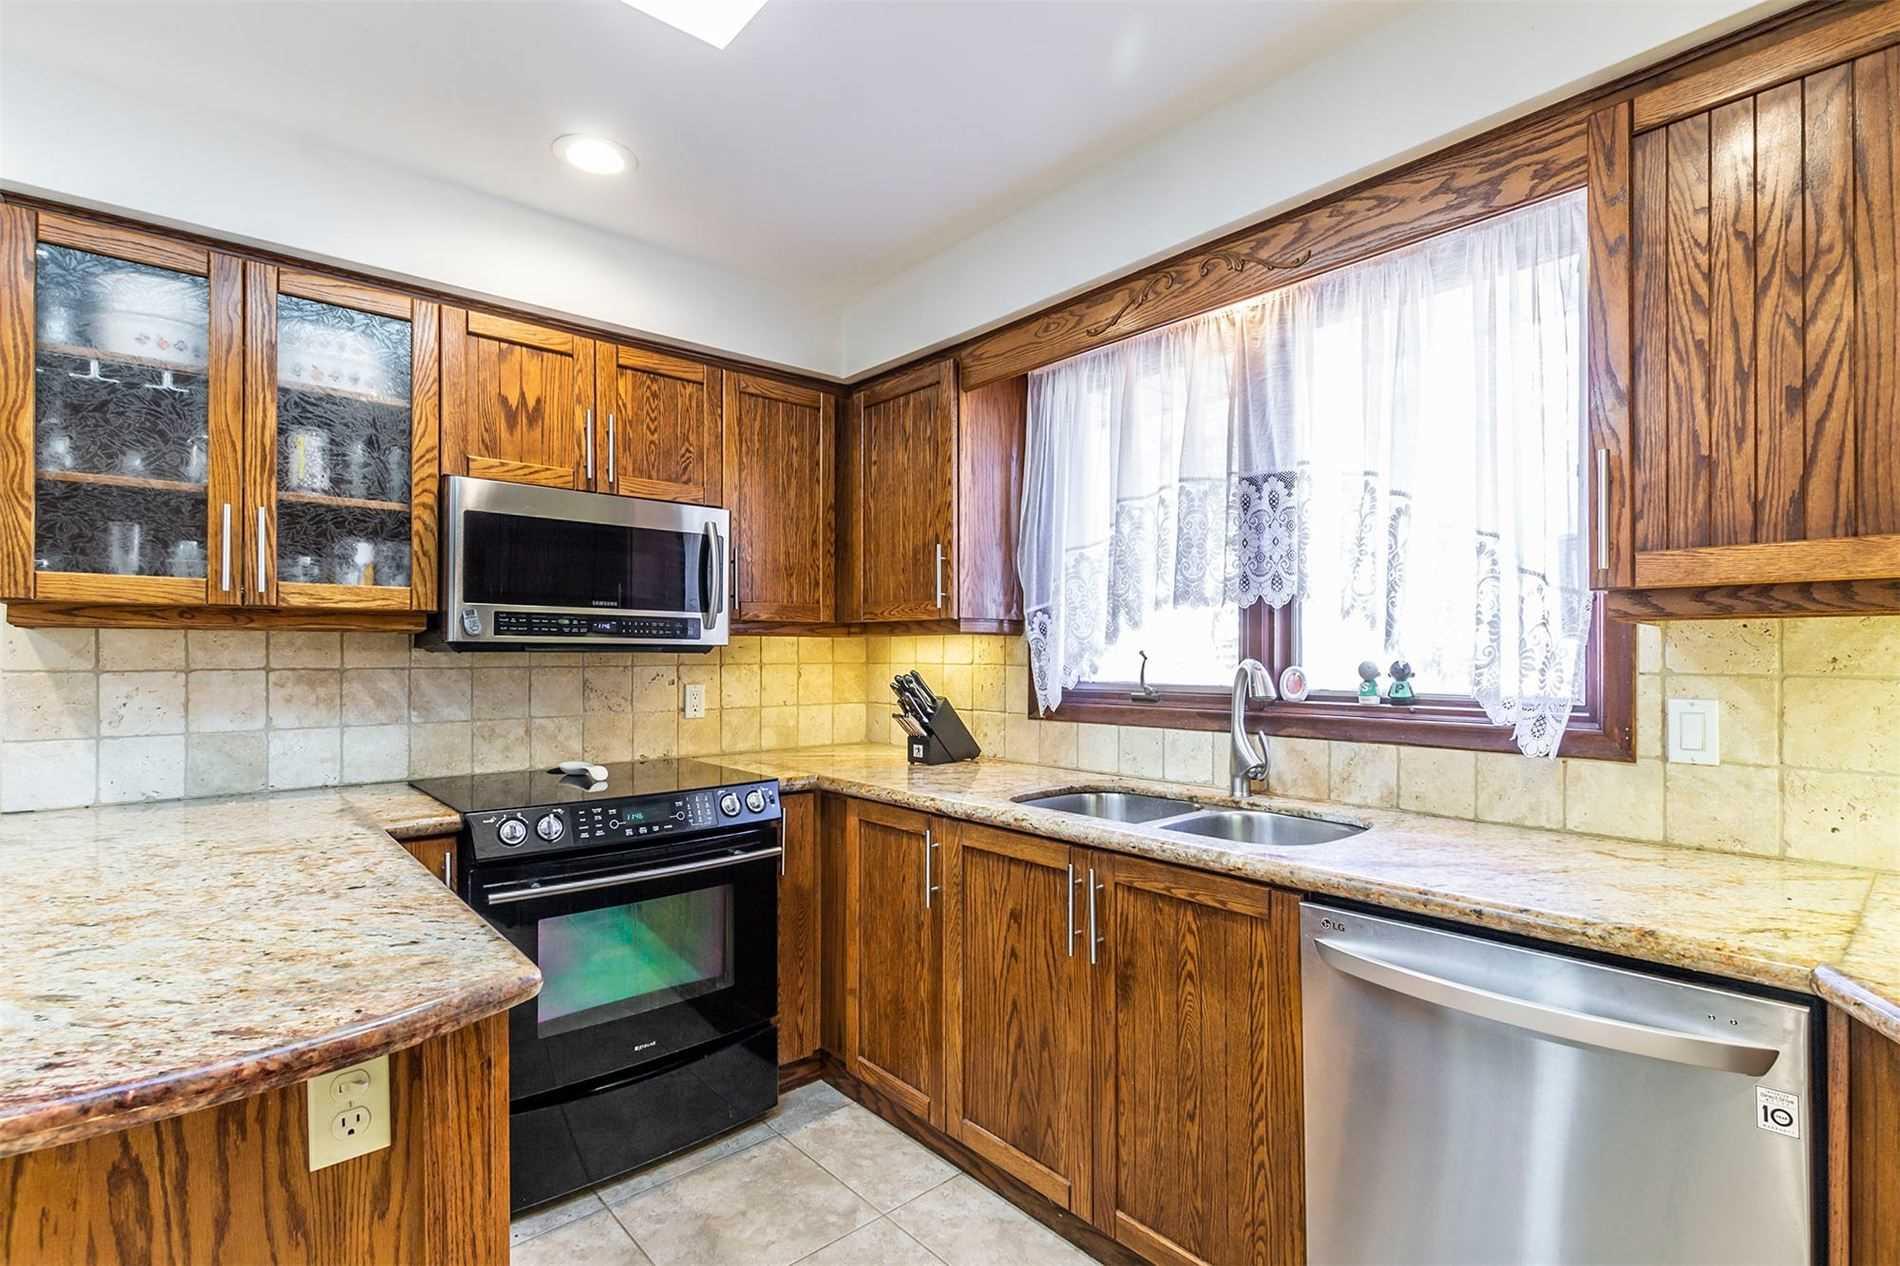 7043 Appleby Line, Milton, Ontario L9T 2Y1, 3 Bedrooms Bedrooms, 11 Rooms Rooms,4 BathroomsBathrooms,Detached,For Sale,Appleby,W5167601